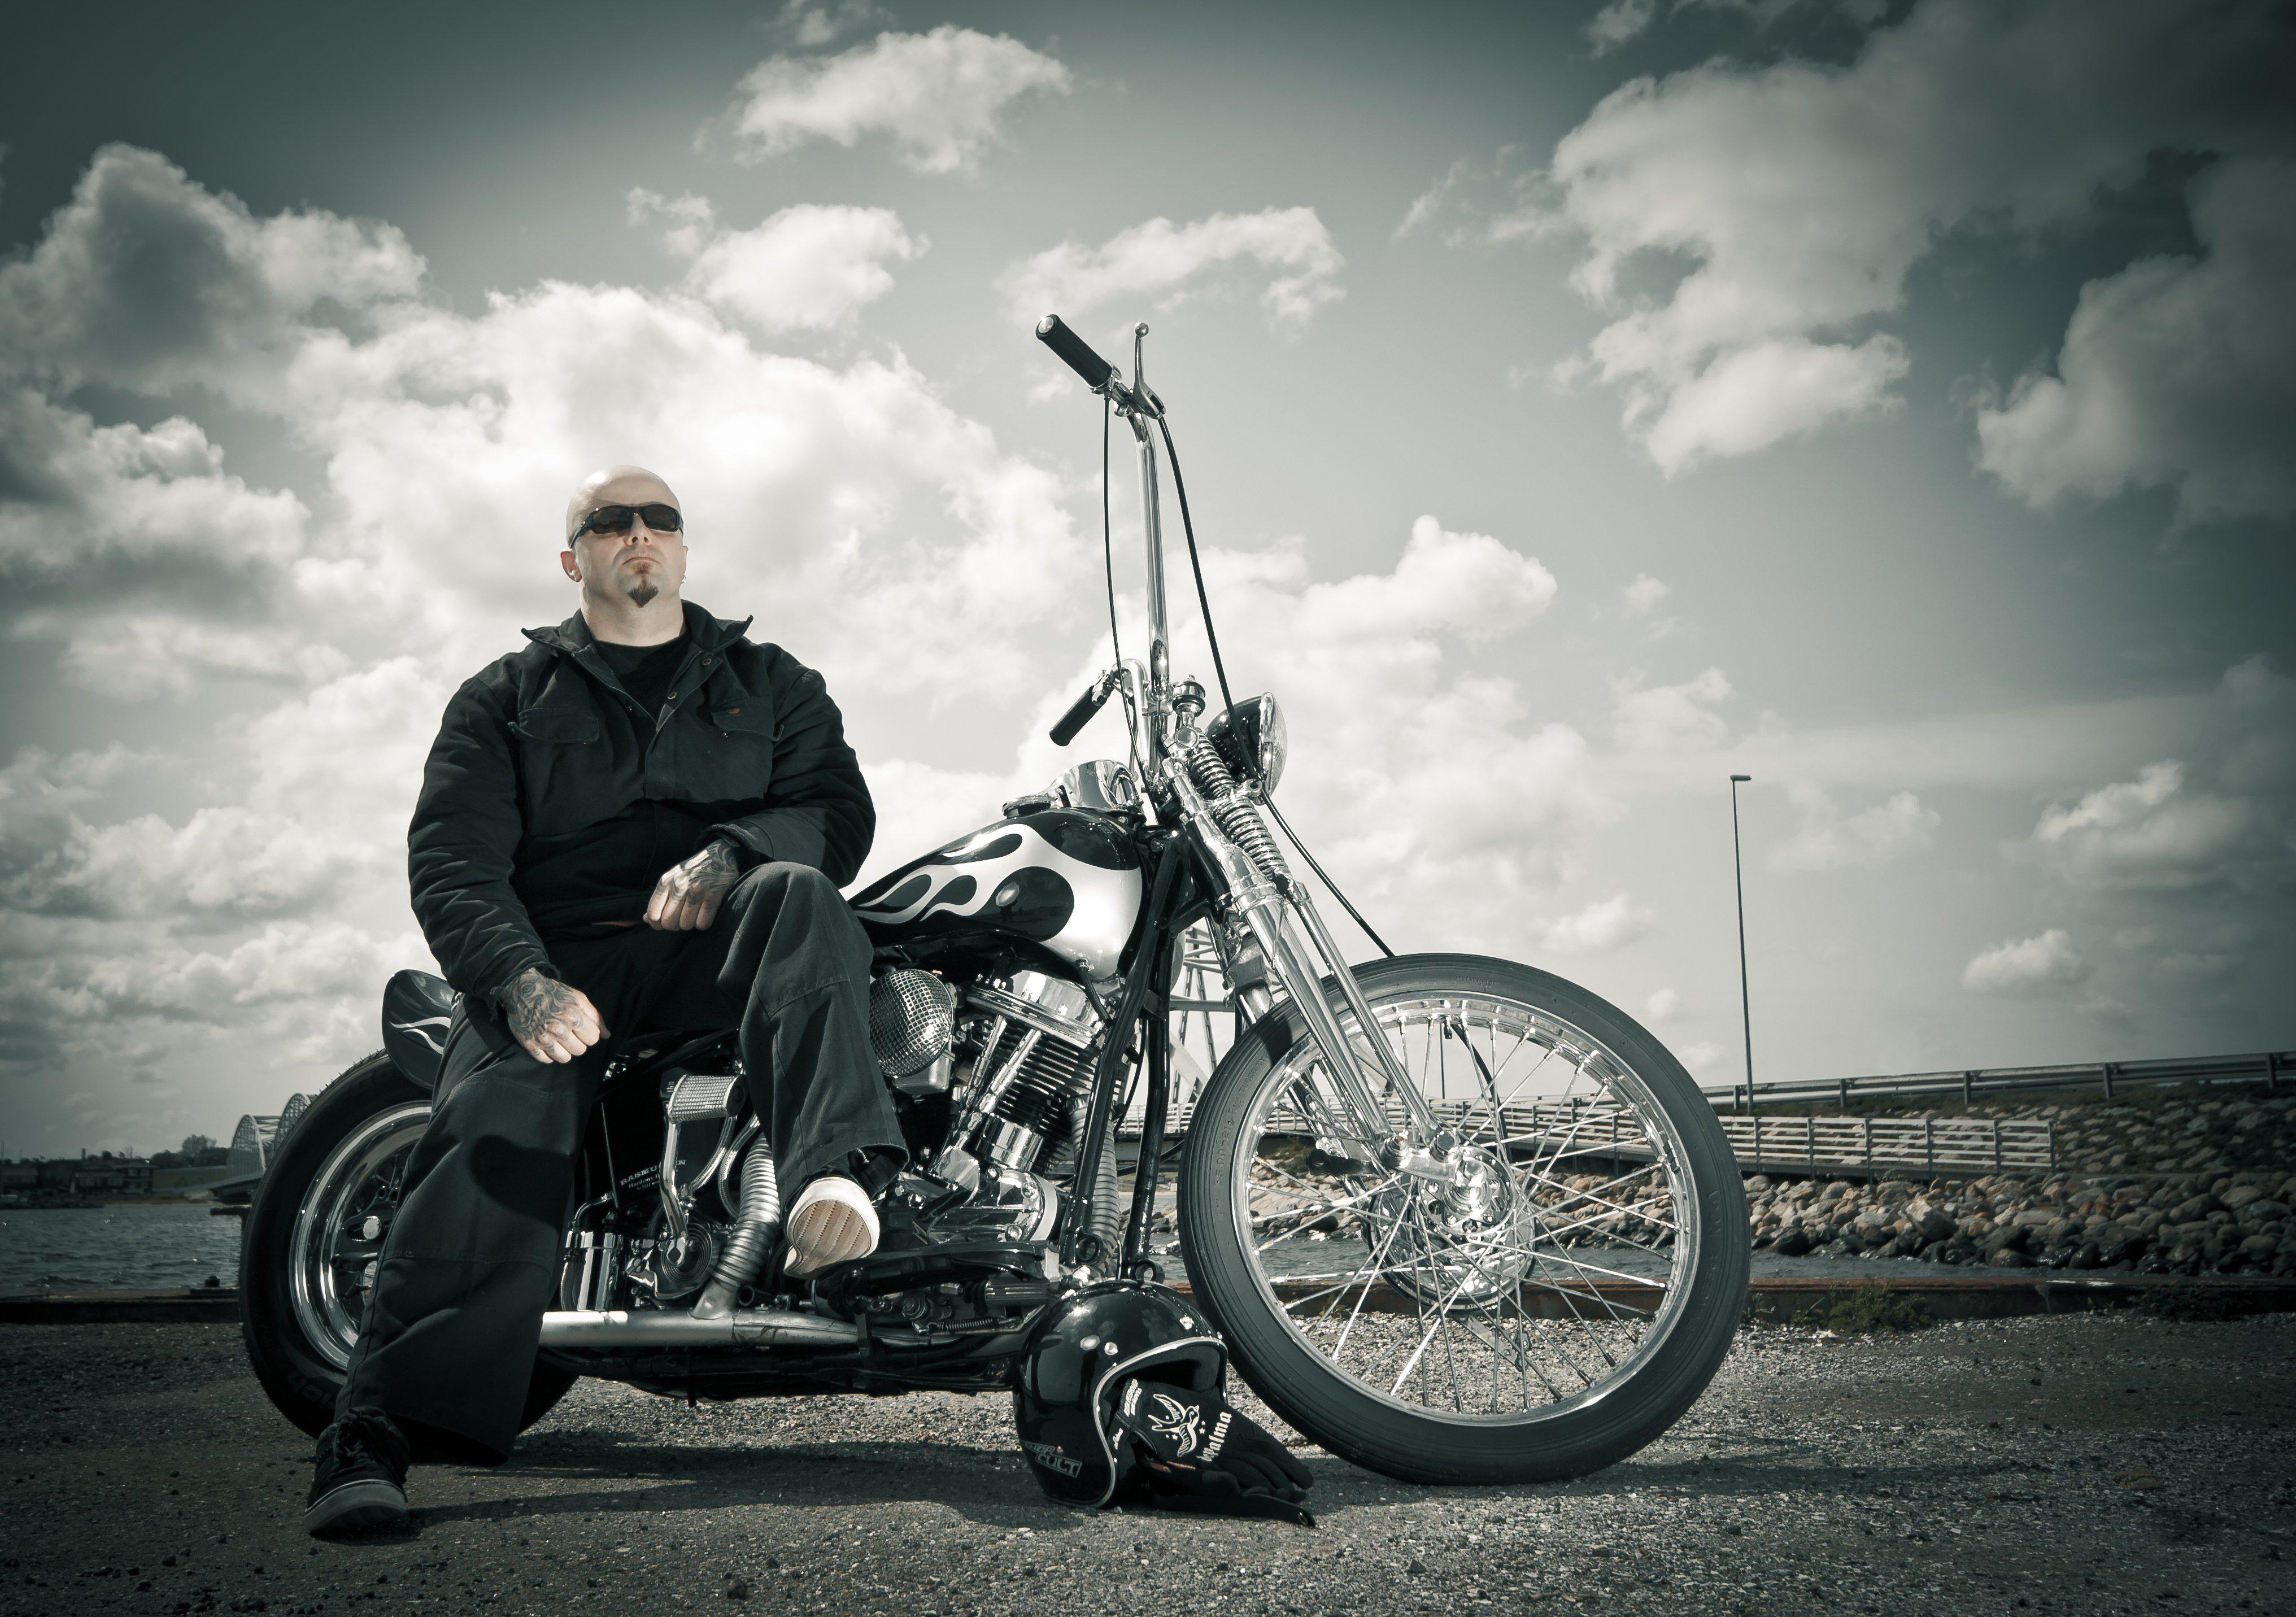 biker wallpaper - photo #23